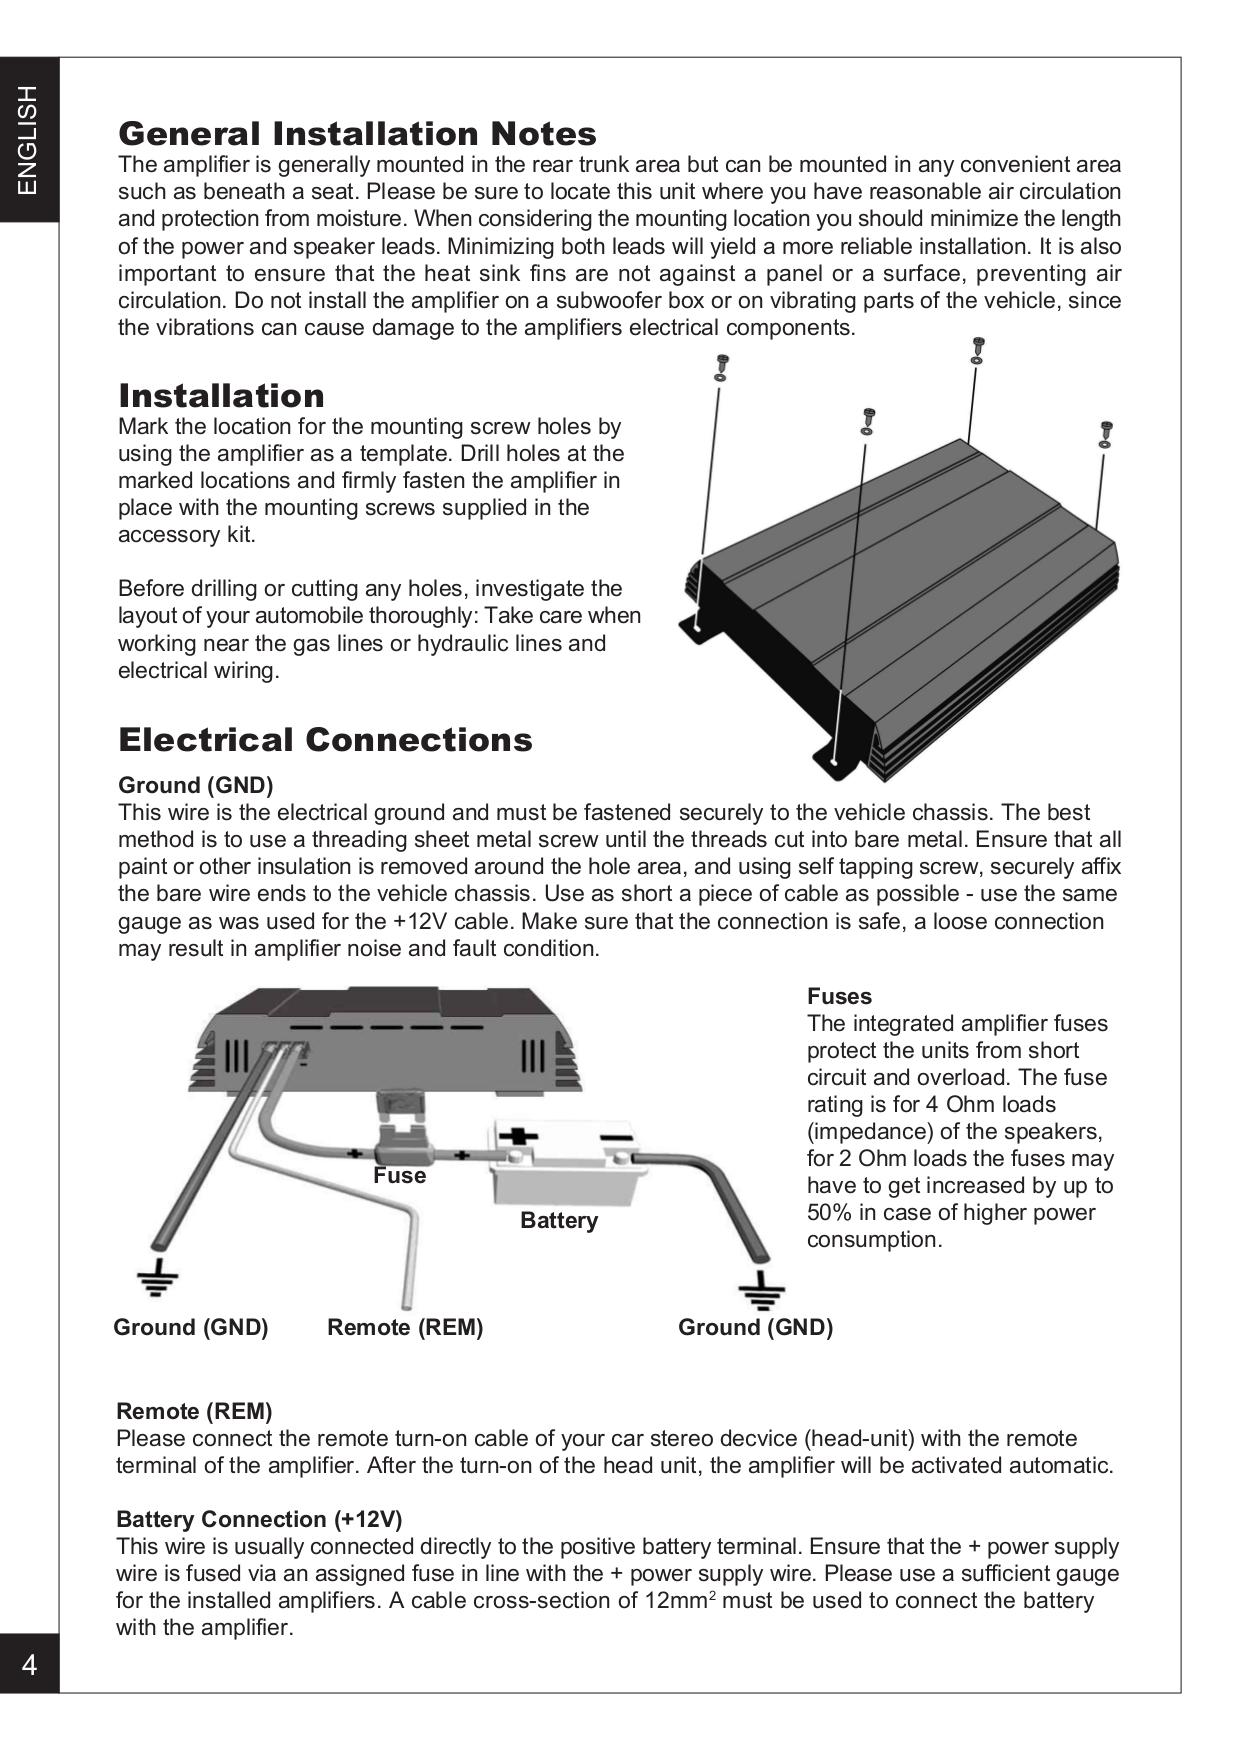 pdf manual for renegade car amplifier ren 550 s rh umlib com Renegade Amp Kit Renegade Amplifier Logo